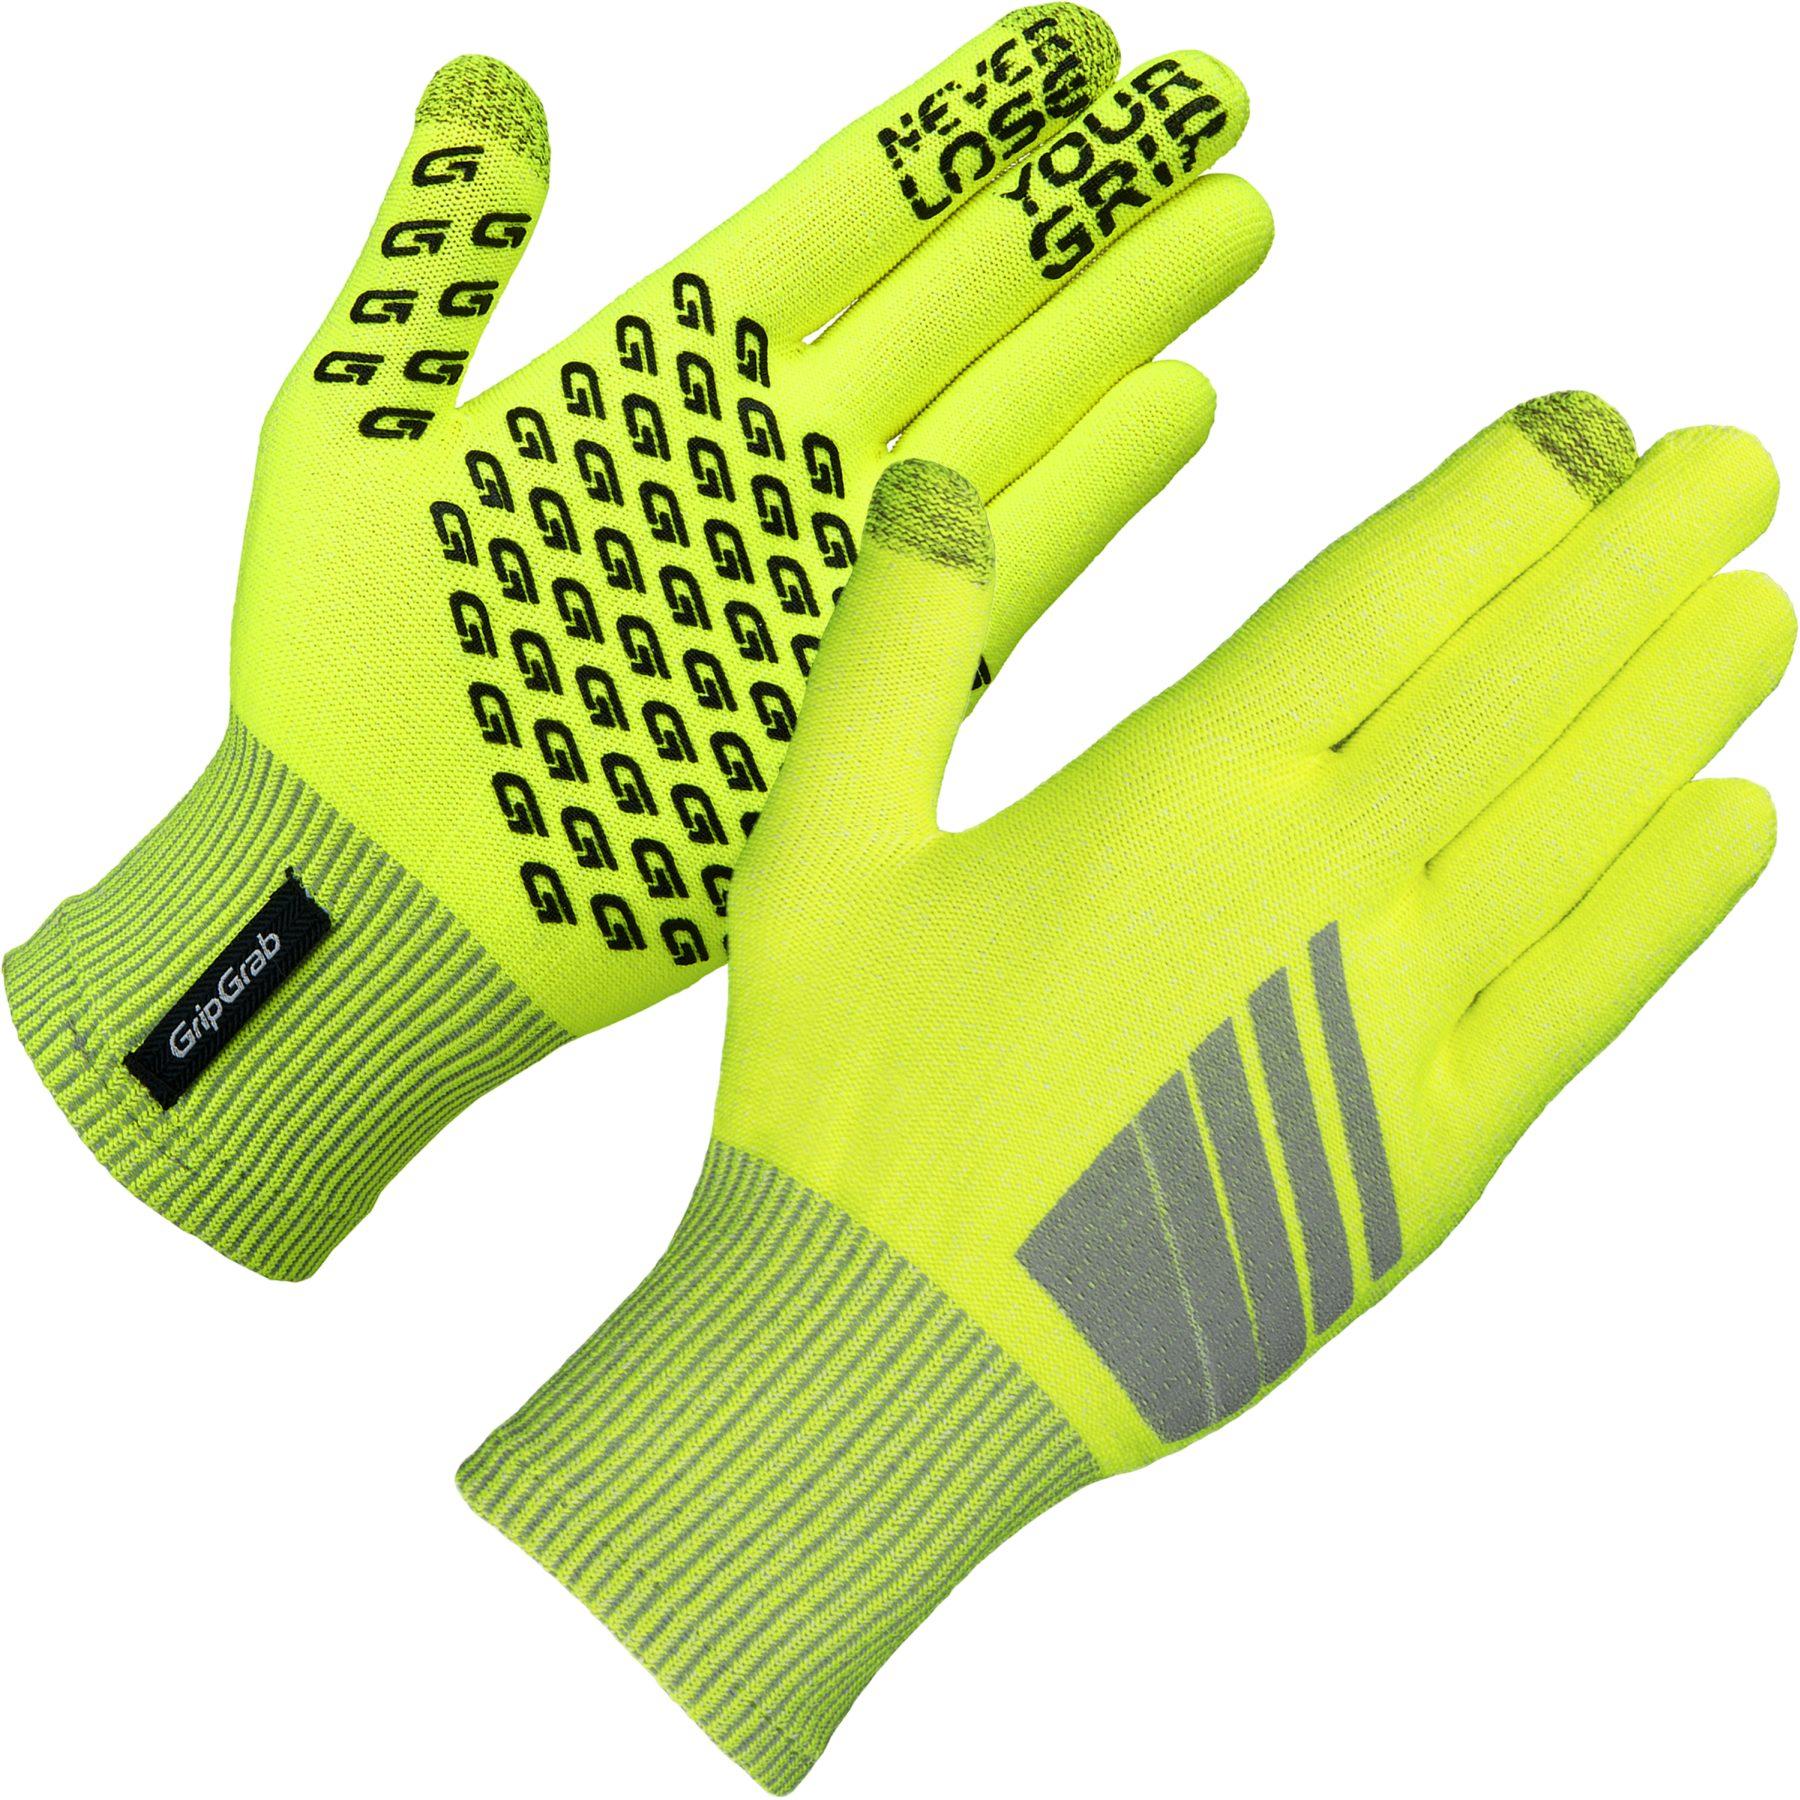 GripGrab Primavera Hi-Vis Midseason Glove - Yellow Hi-Vis